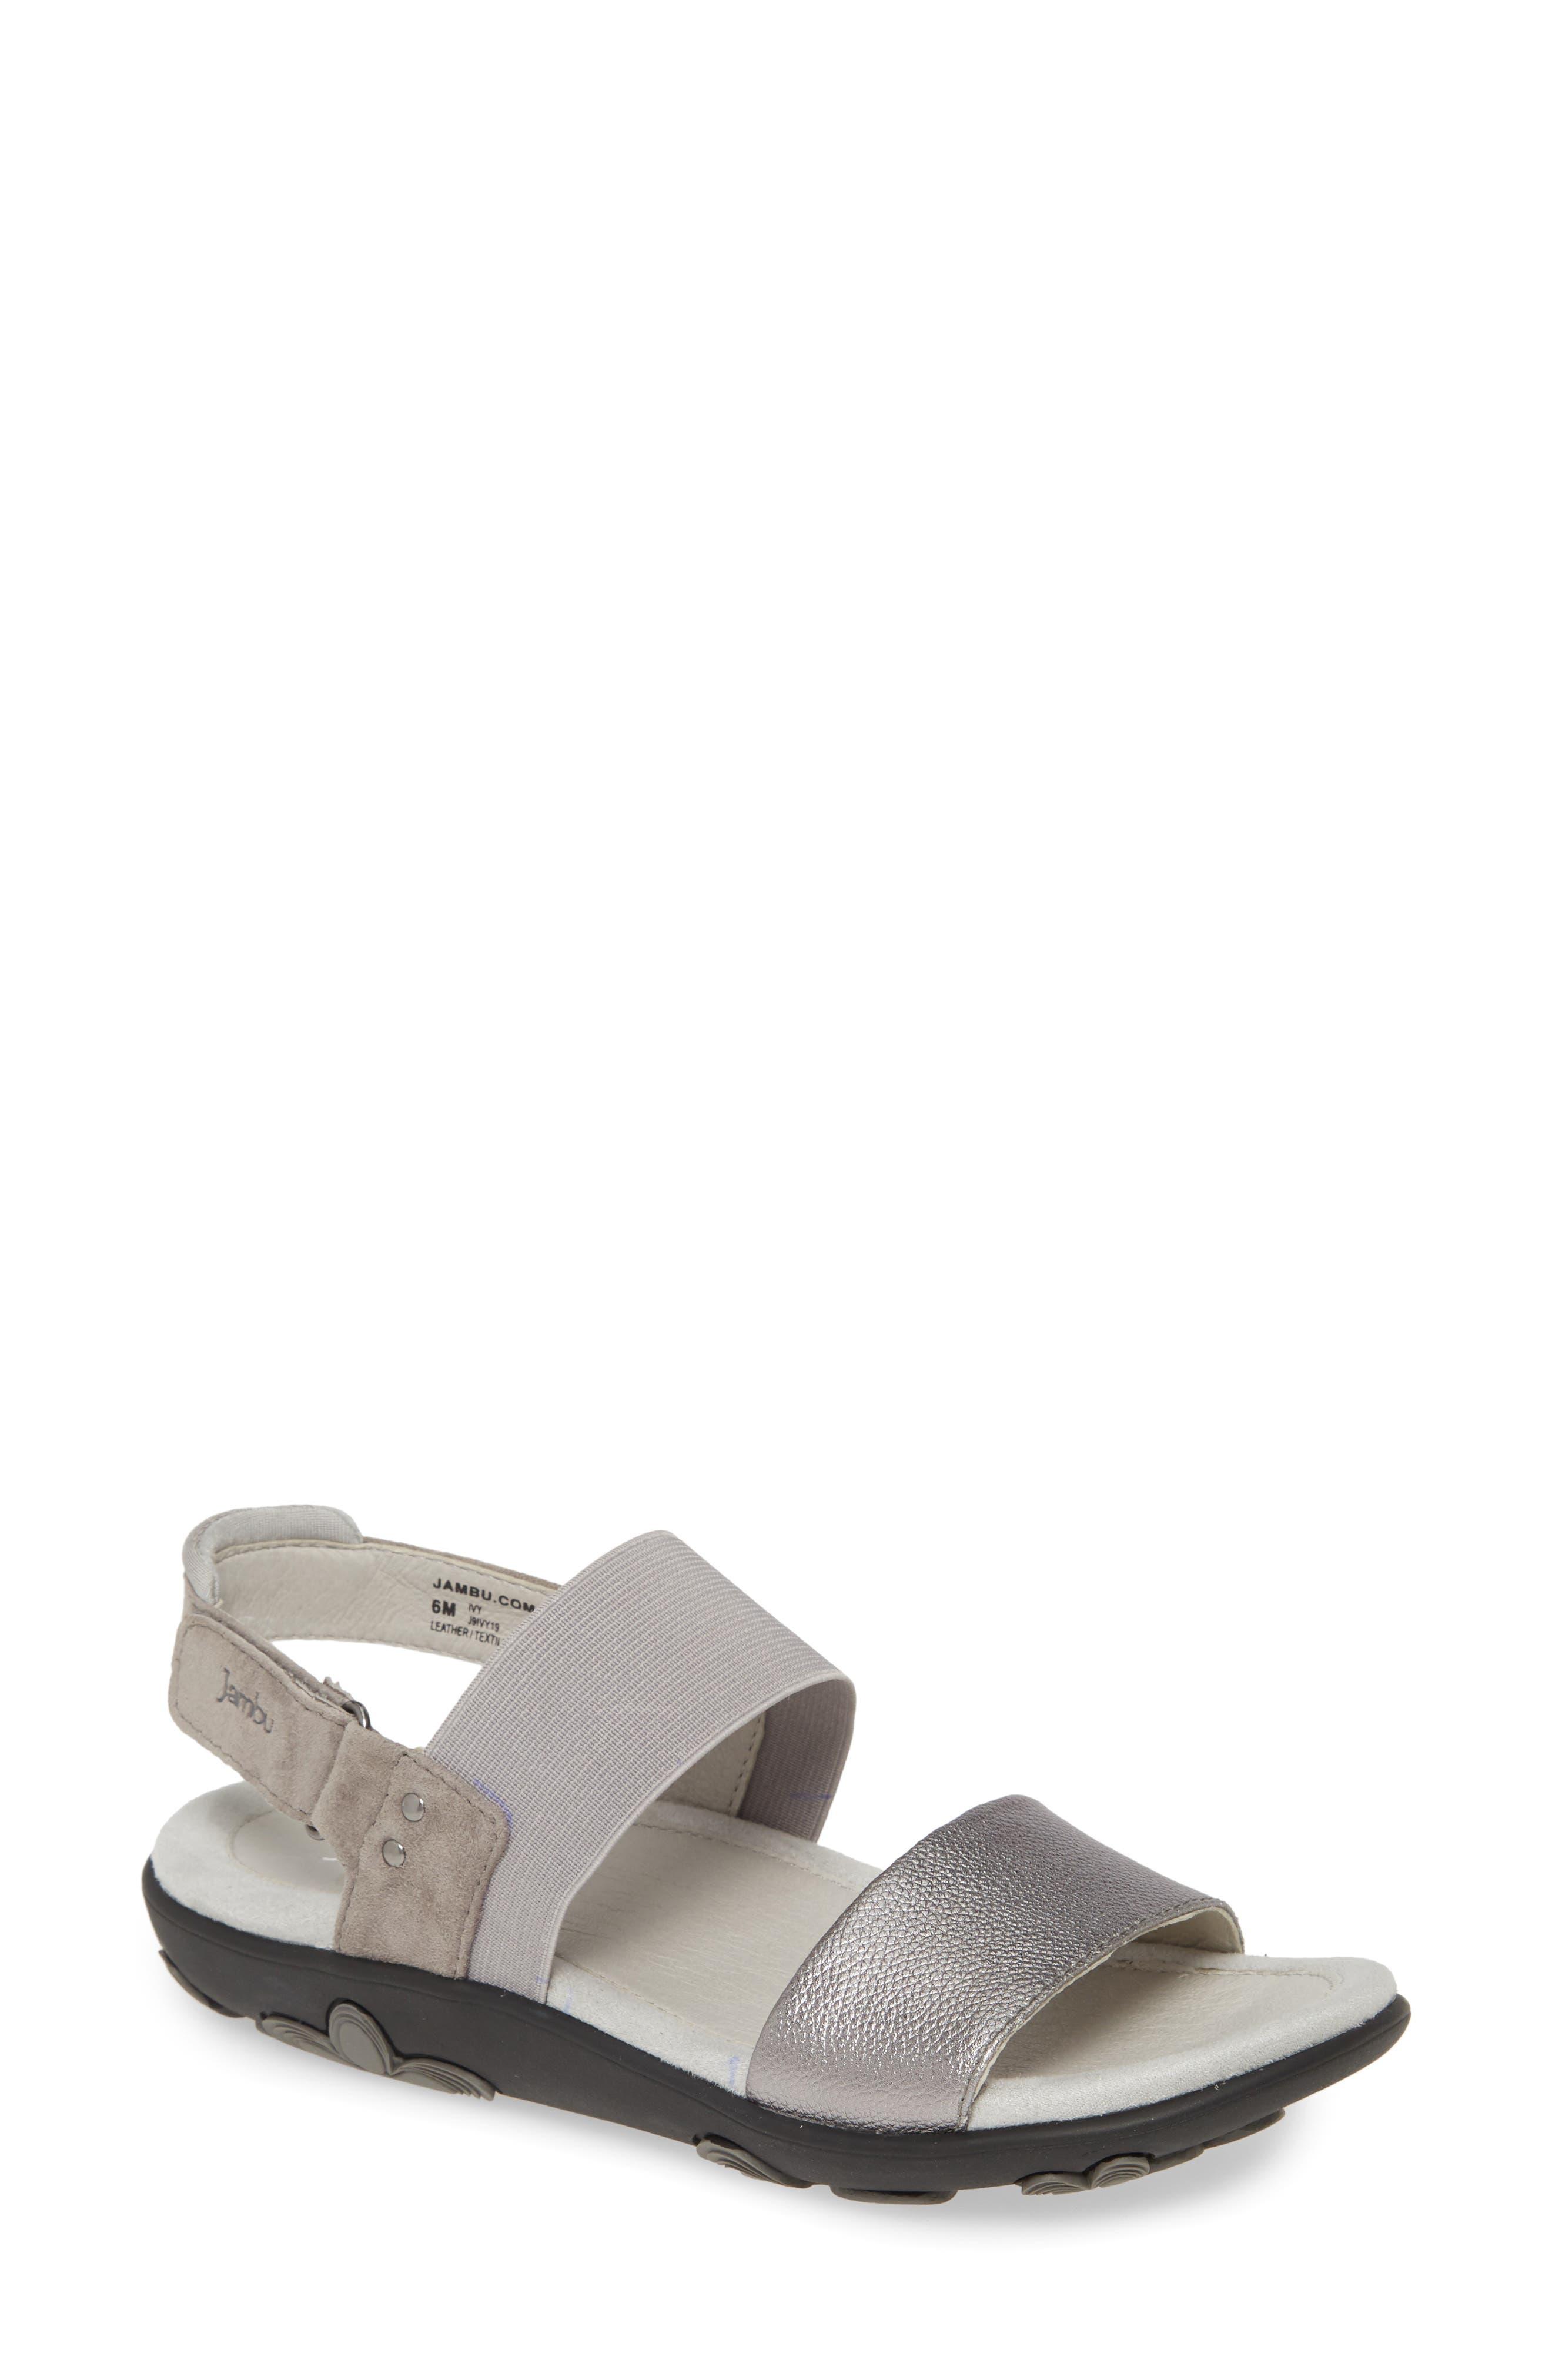 Jambu Shoes Sale \u0026 Clearance | Nordstrom